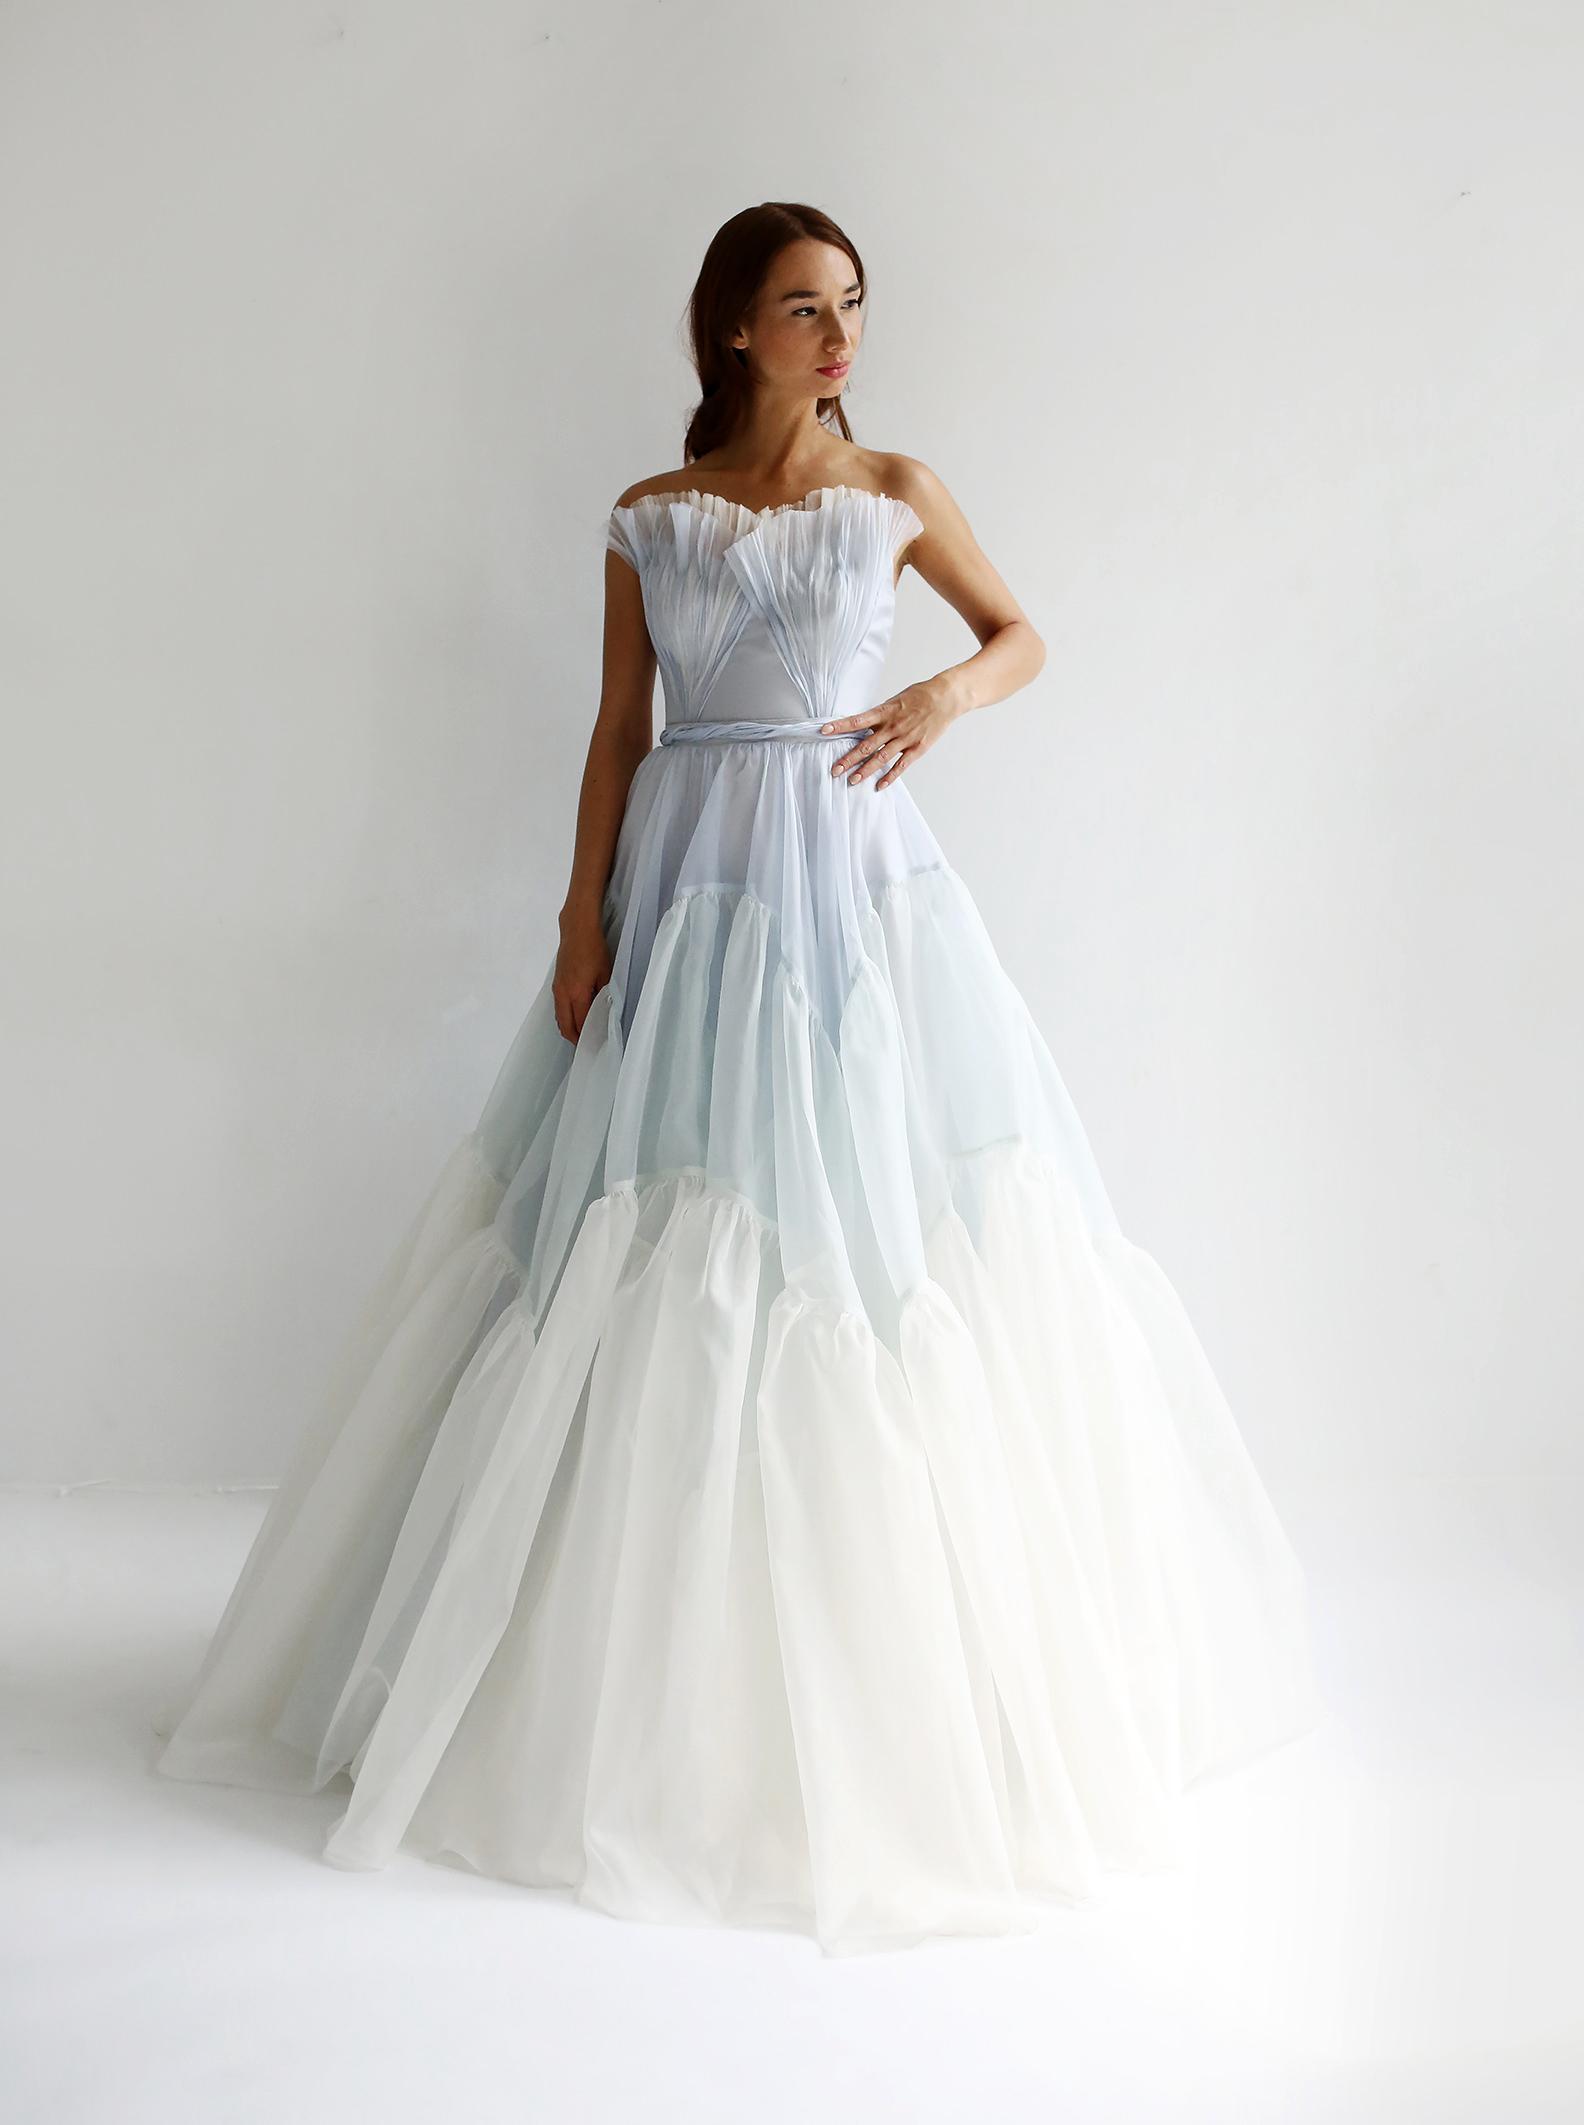 leanne marshall wedding dress spring 2019 strapless ruffles a-line blue